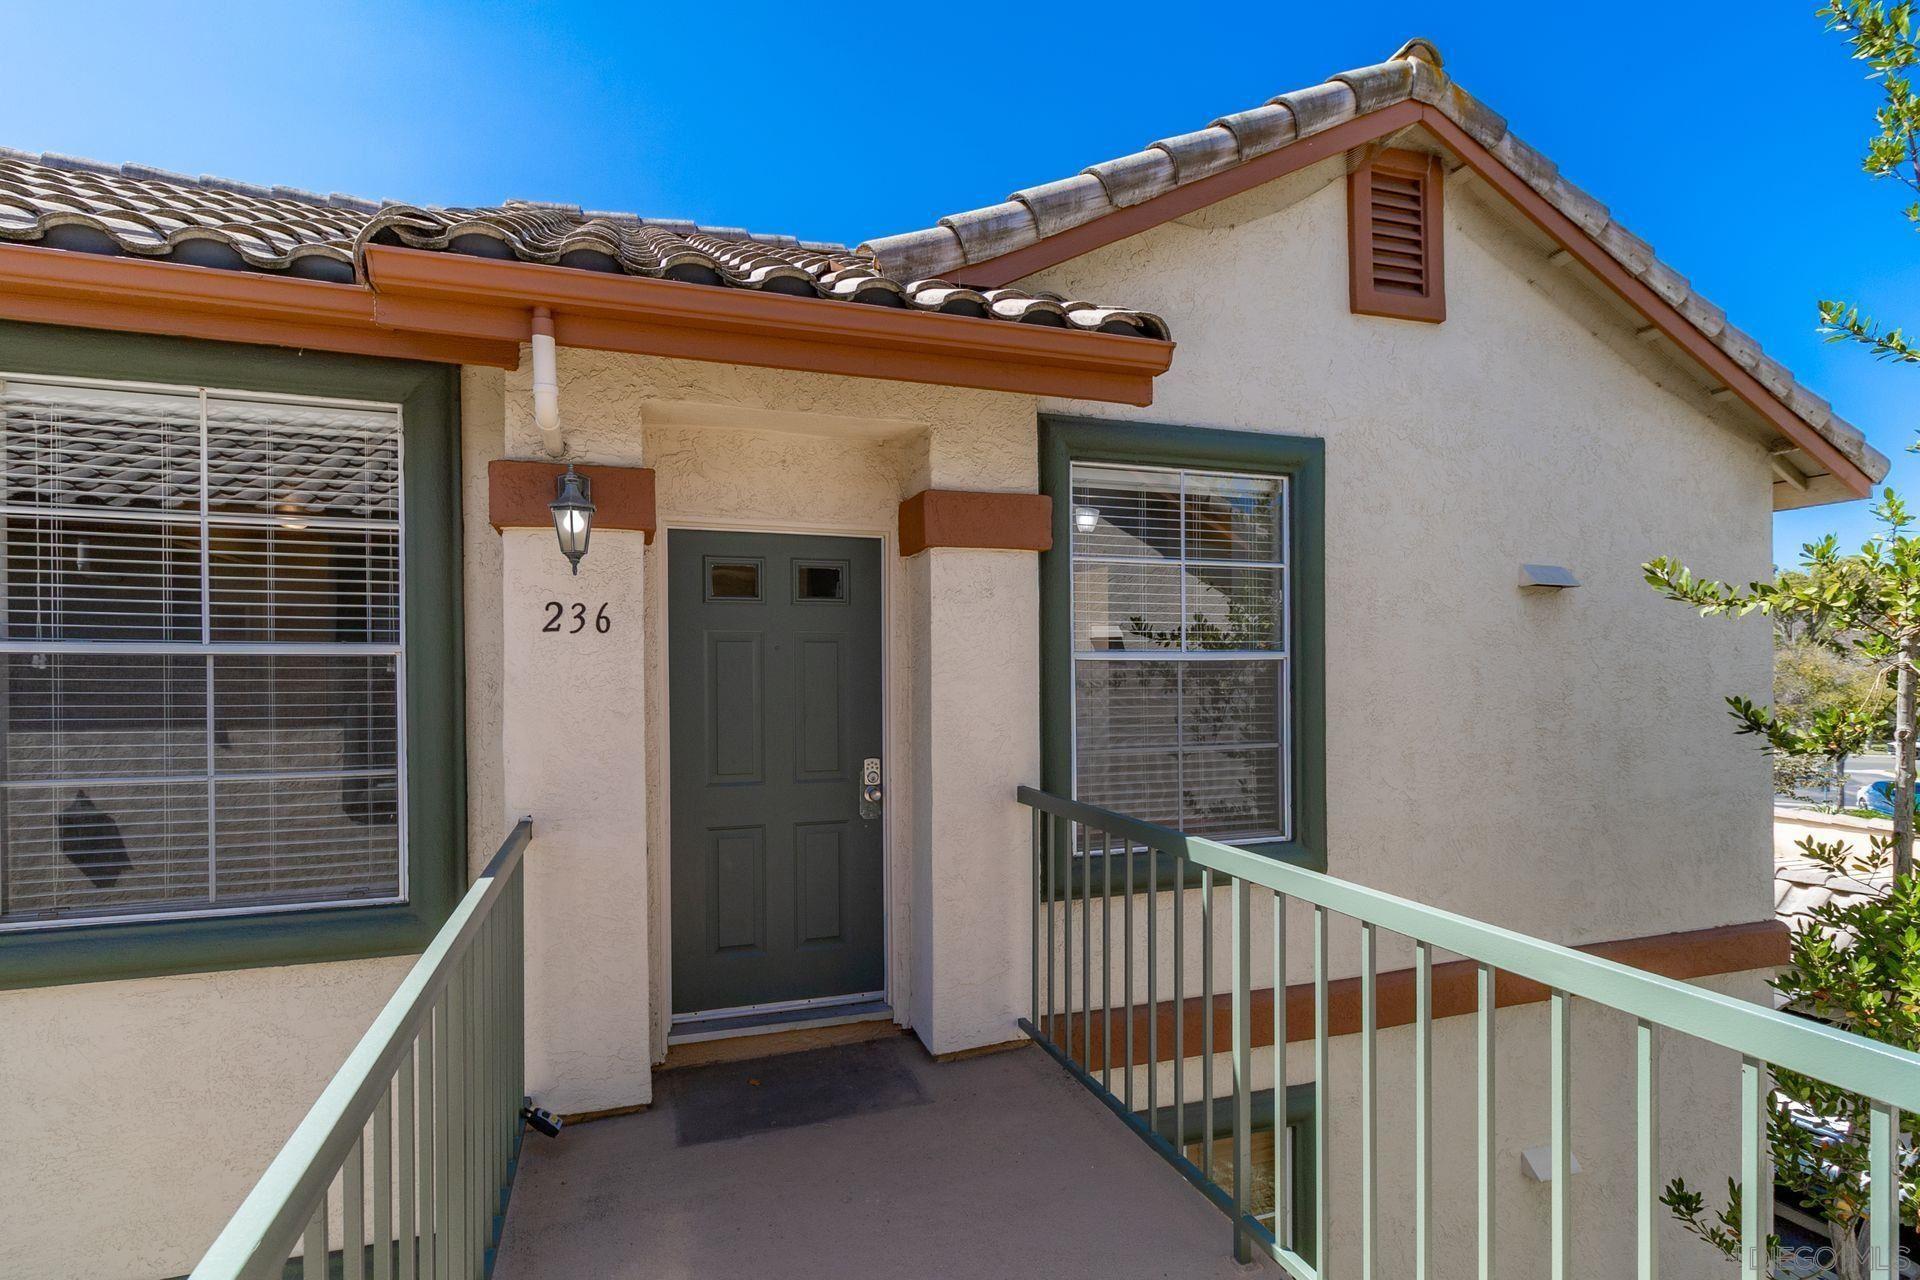 10850 Sabre Hill Dr #236, San Diego, CA 92128 - MLS#: 210026592